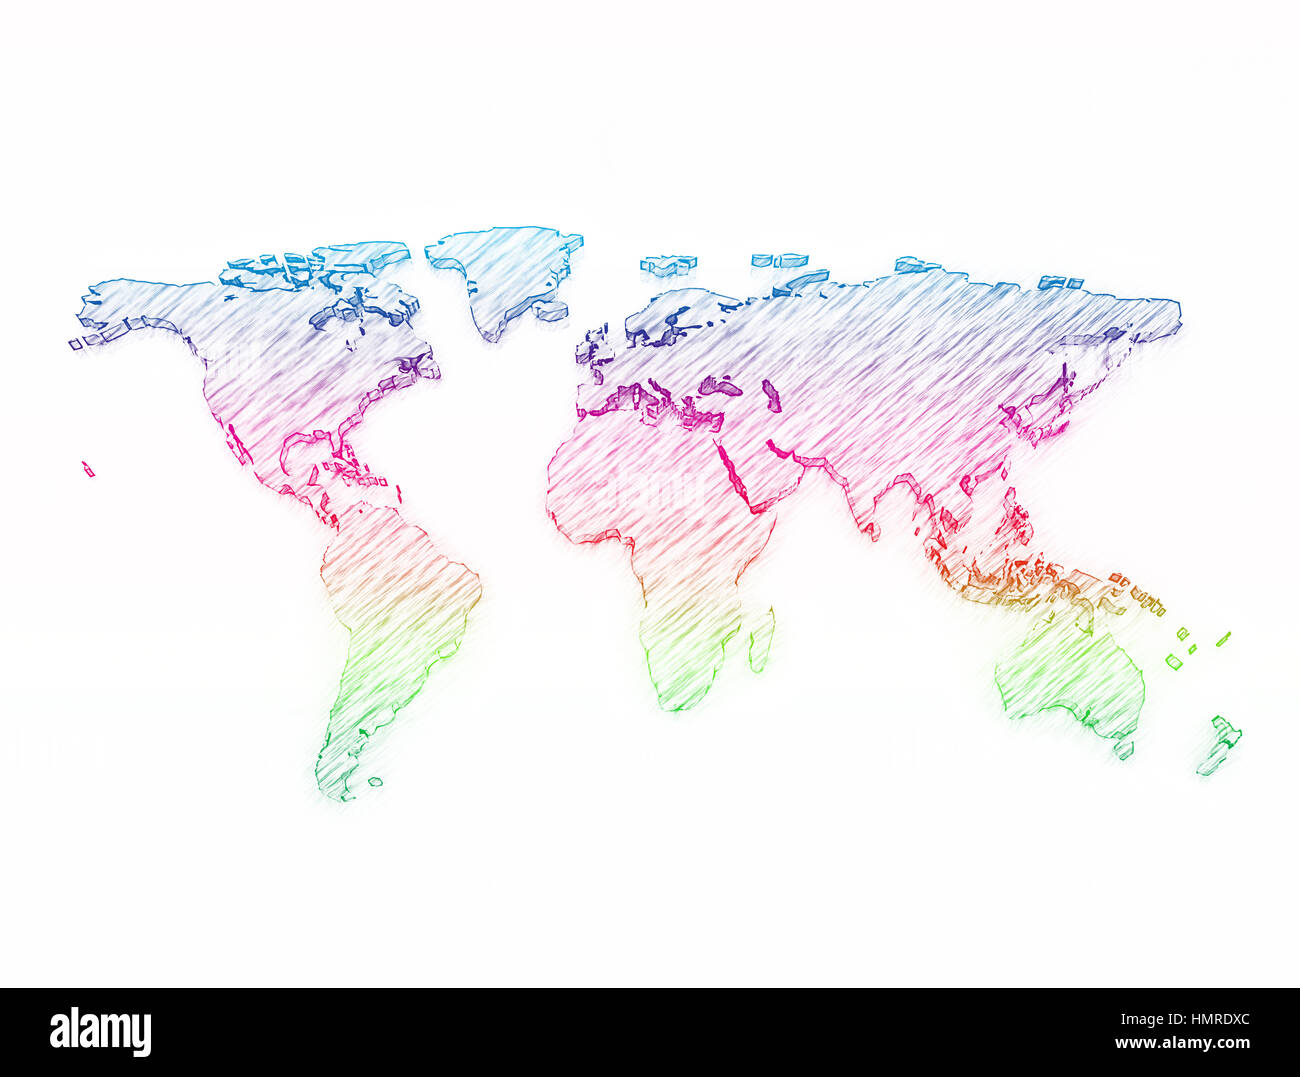 World Map 3d Pencil Sketch Multi Color Stock Photo 133281524 Alamy